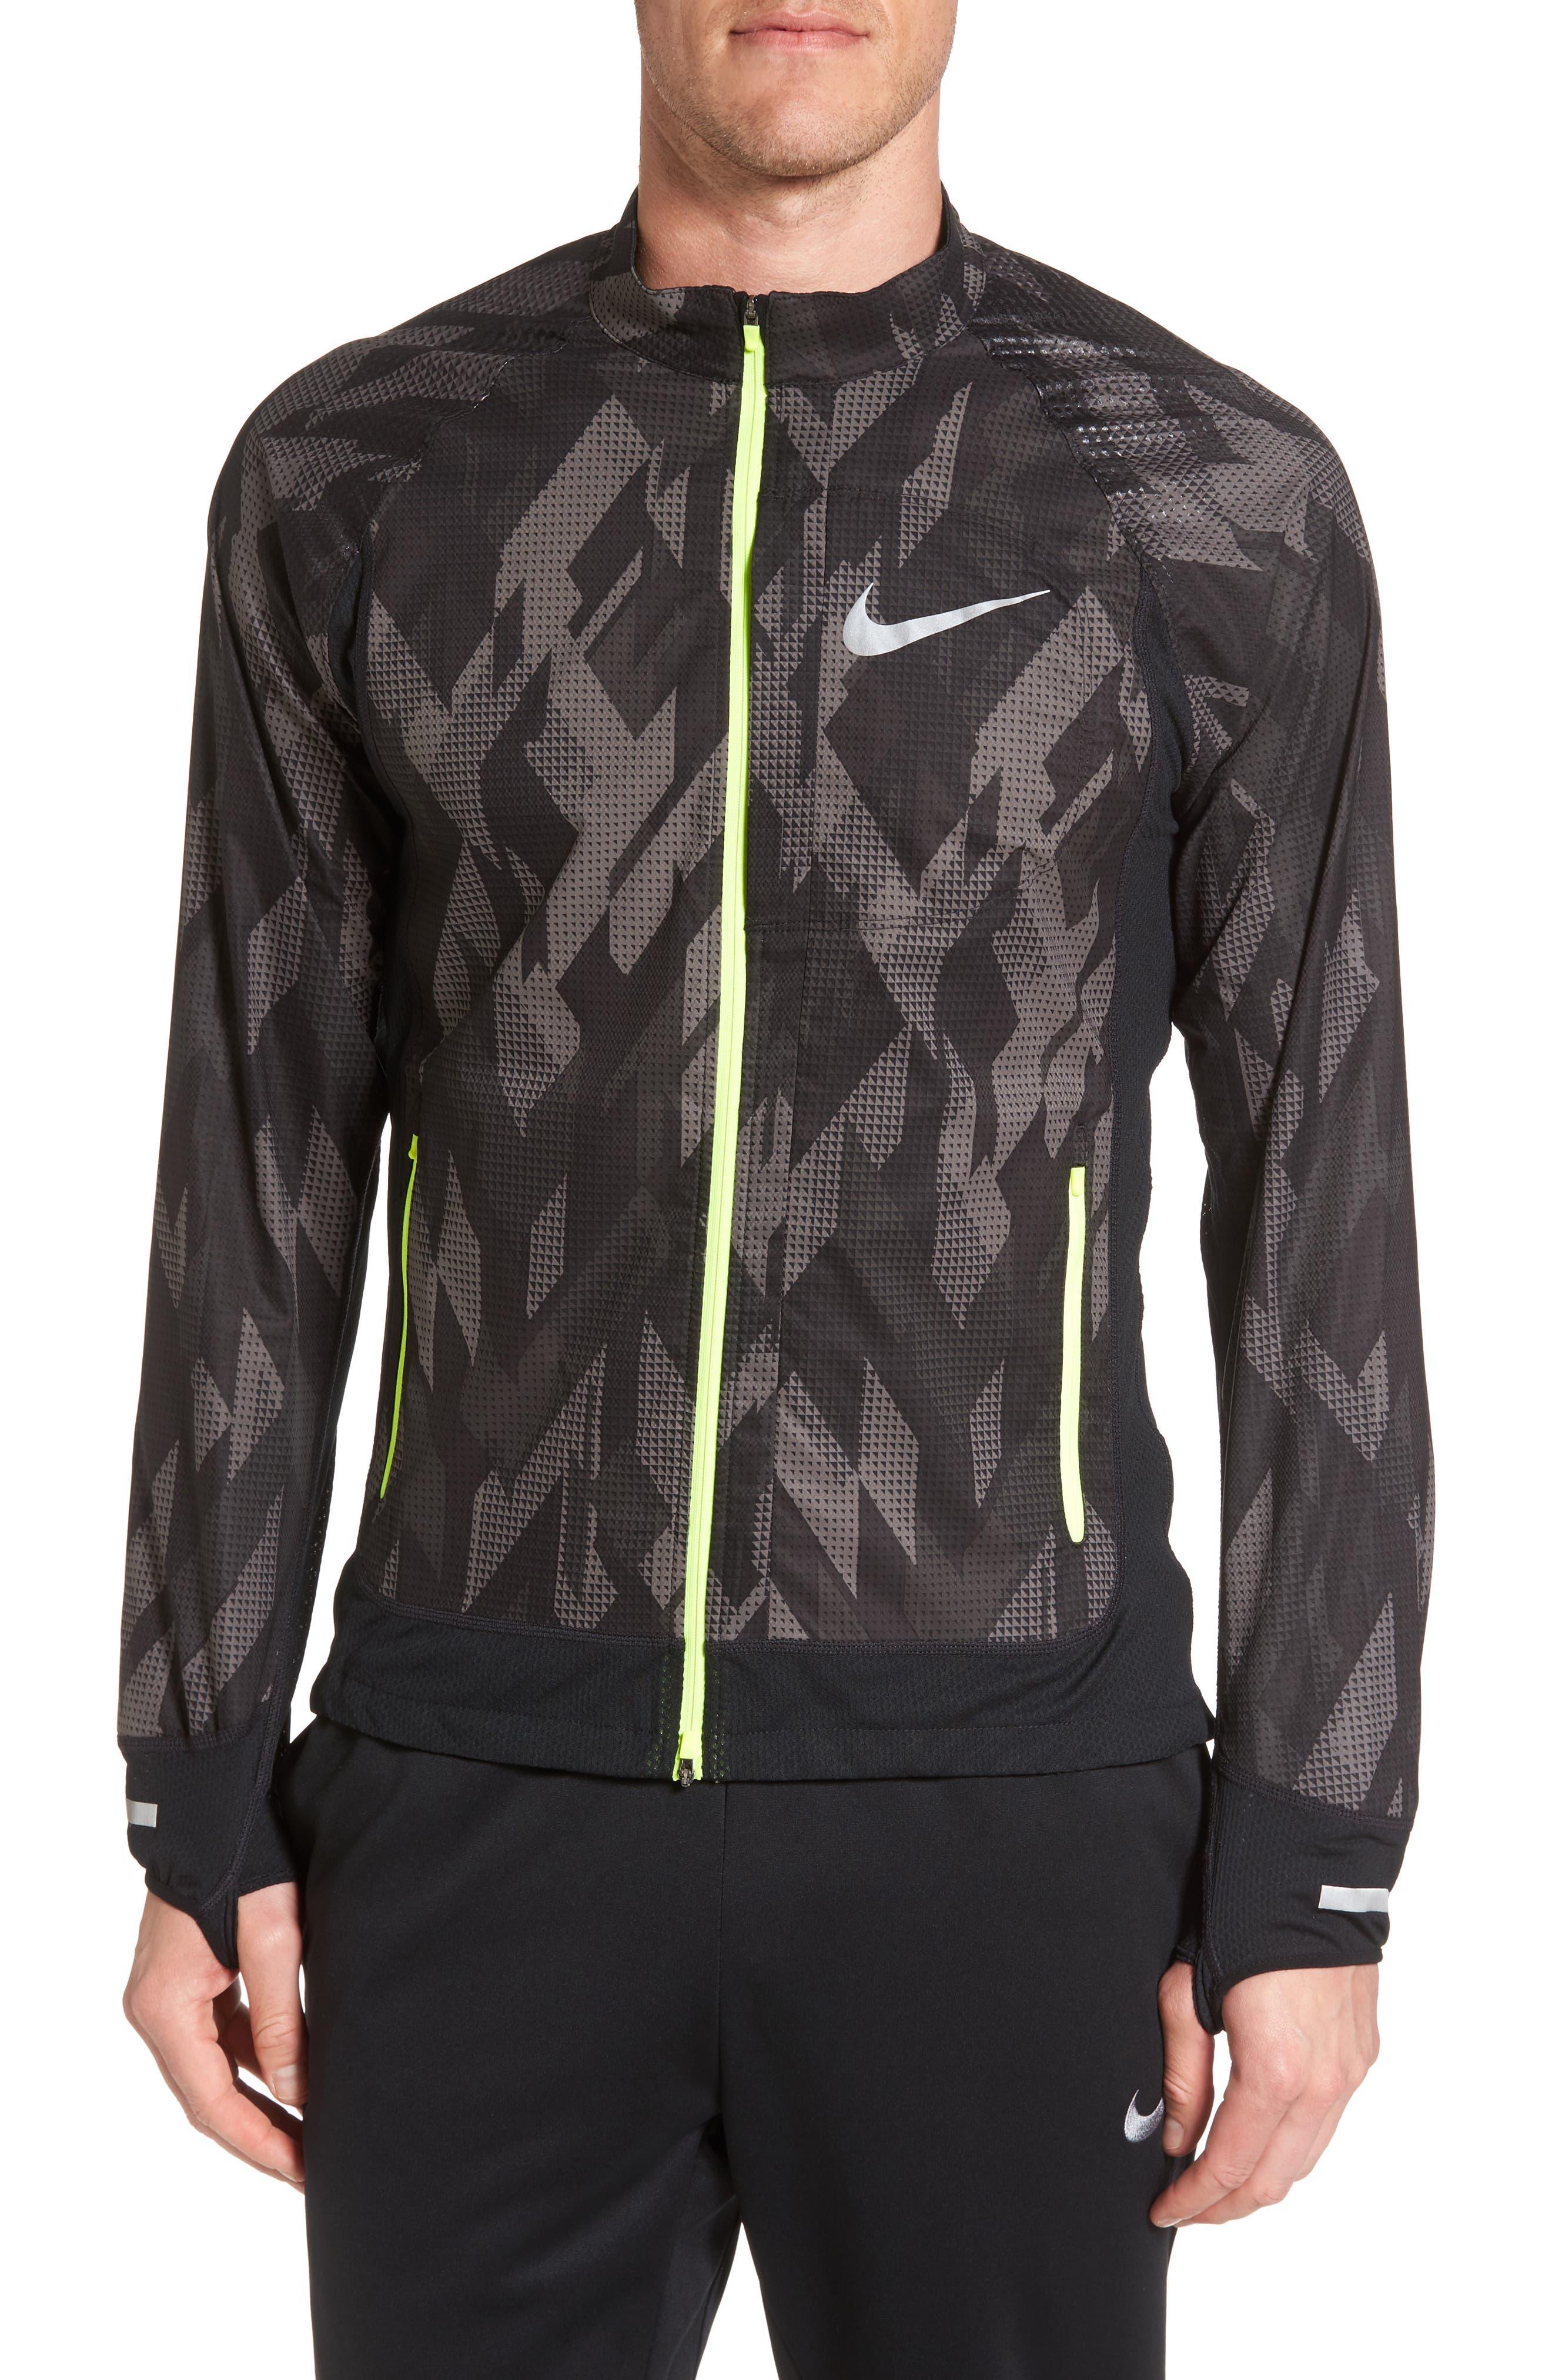 Flex Running Jacket,                             Main thumbnail 1, color,                             Black/ Black/ Volt